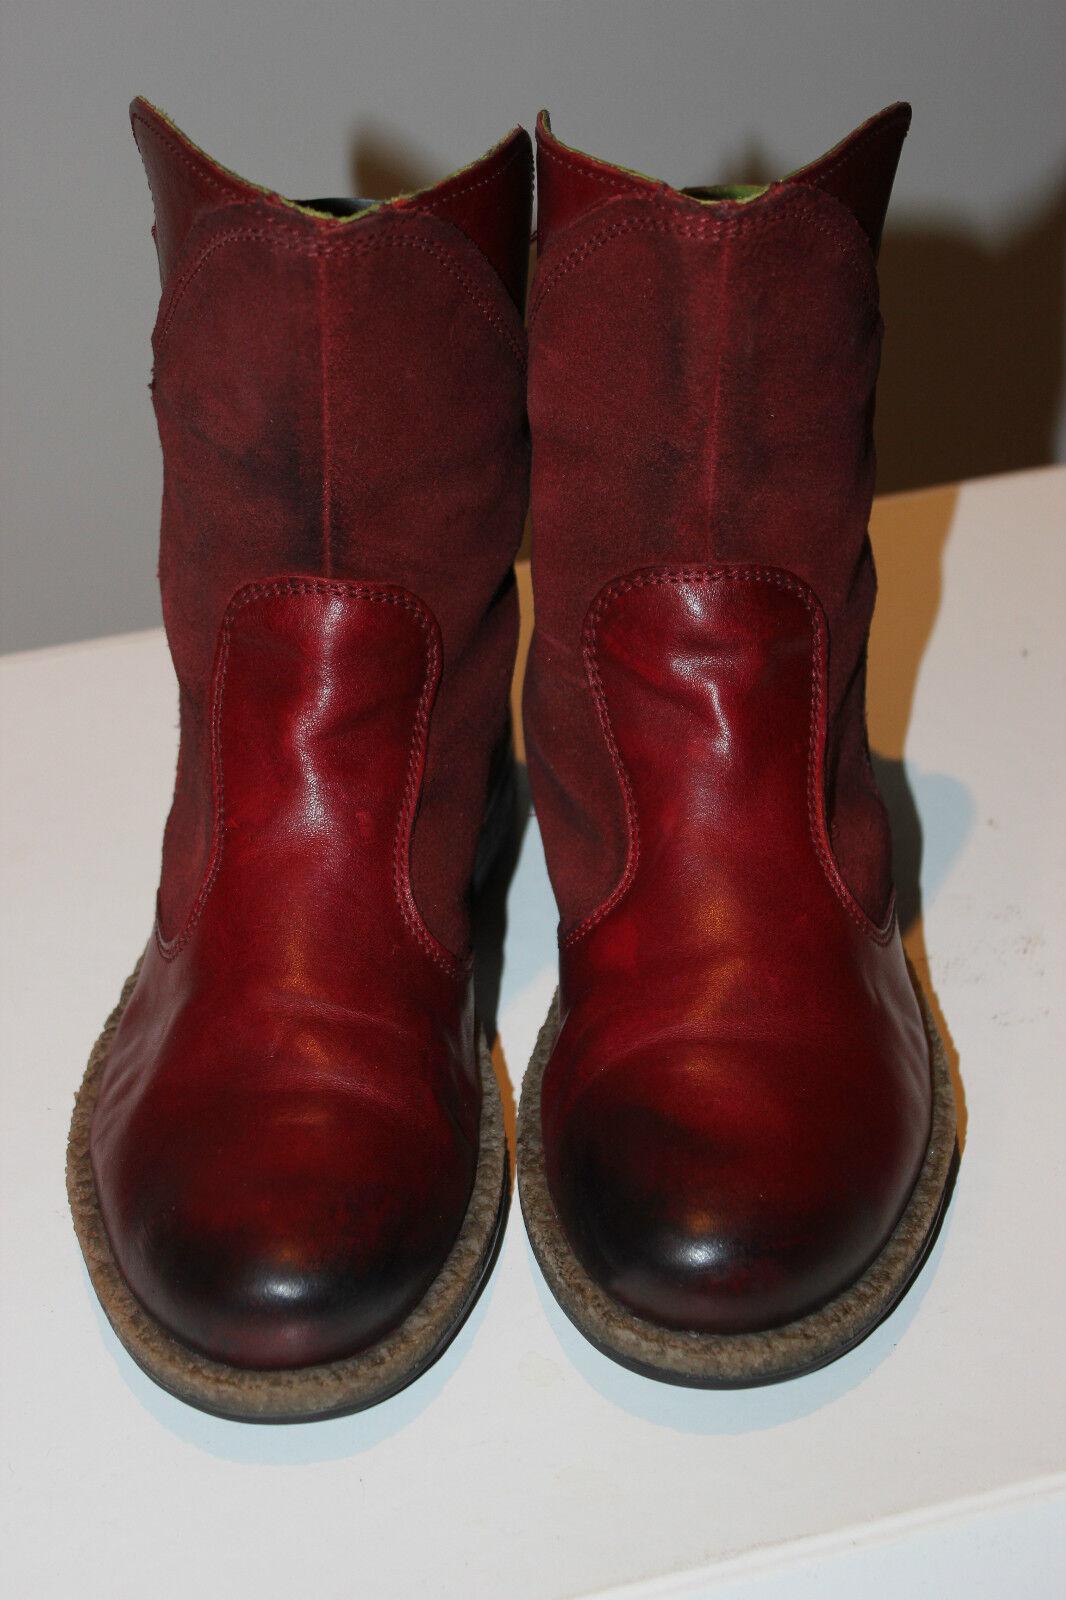 Snipe stivali, super bel rosso vera pelle Biker stivali, Snipe stivali, stivali ... f816b8